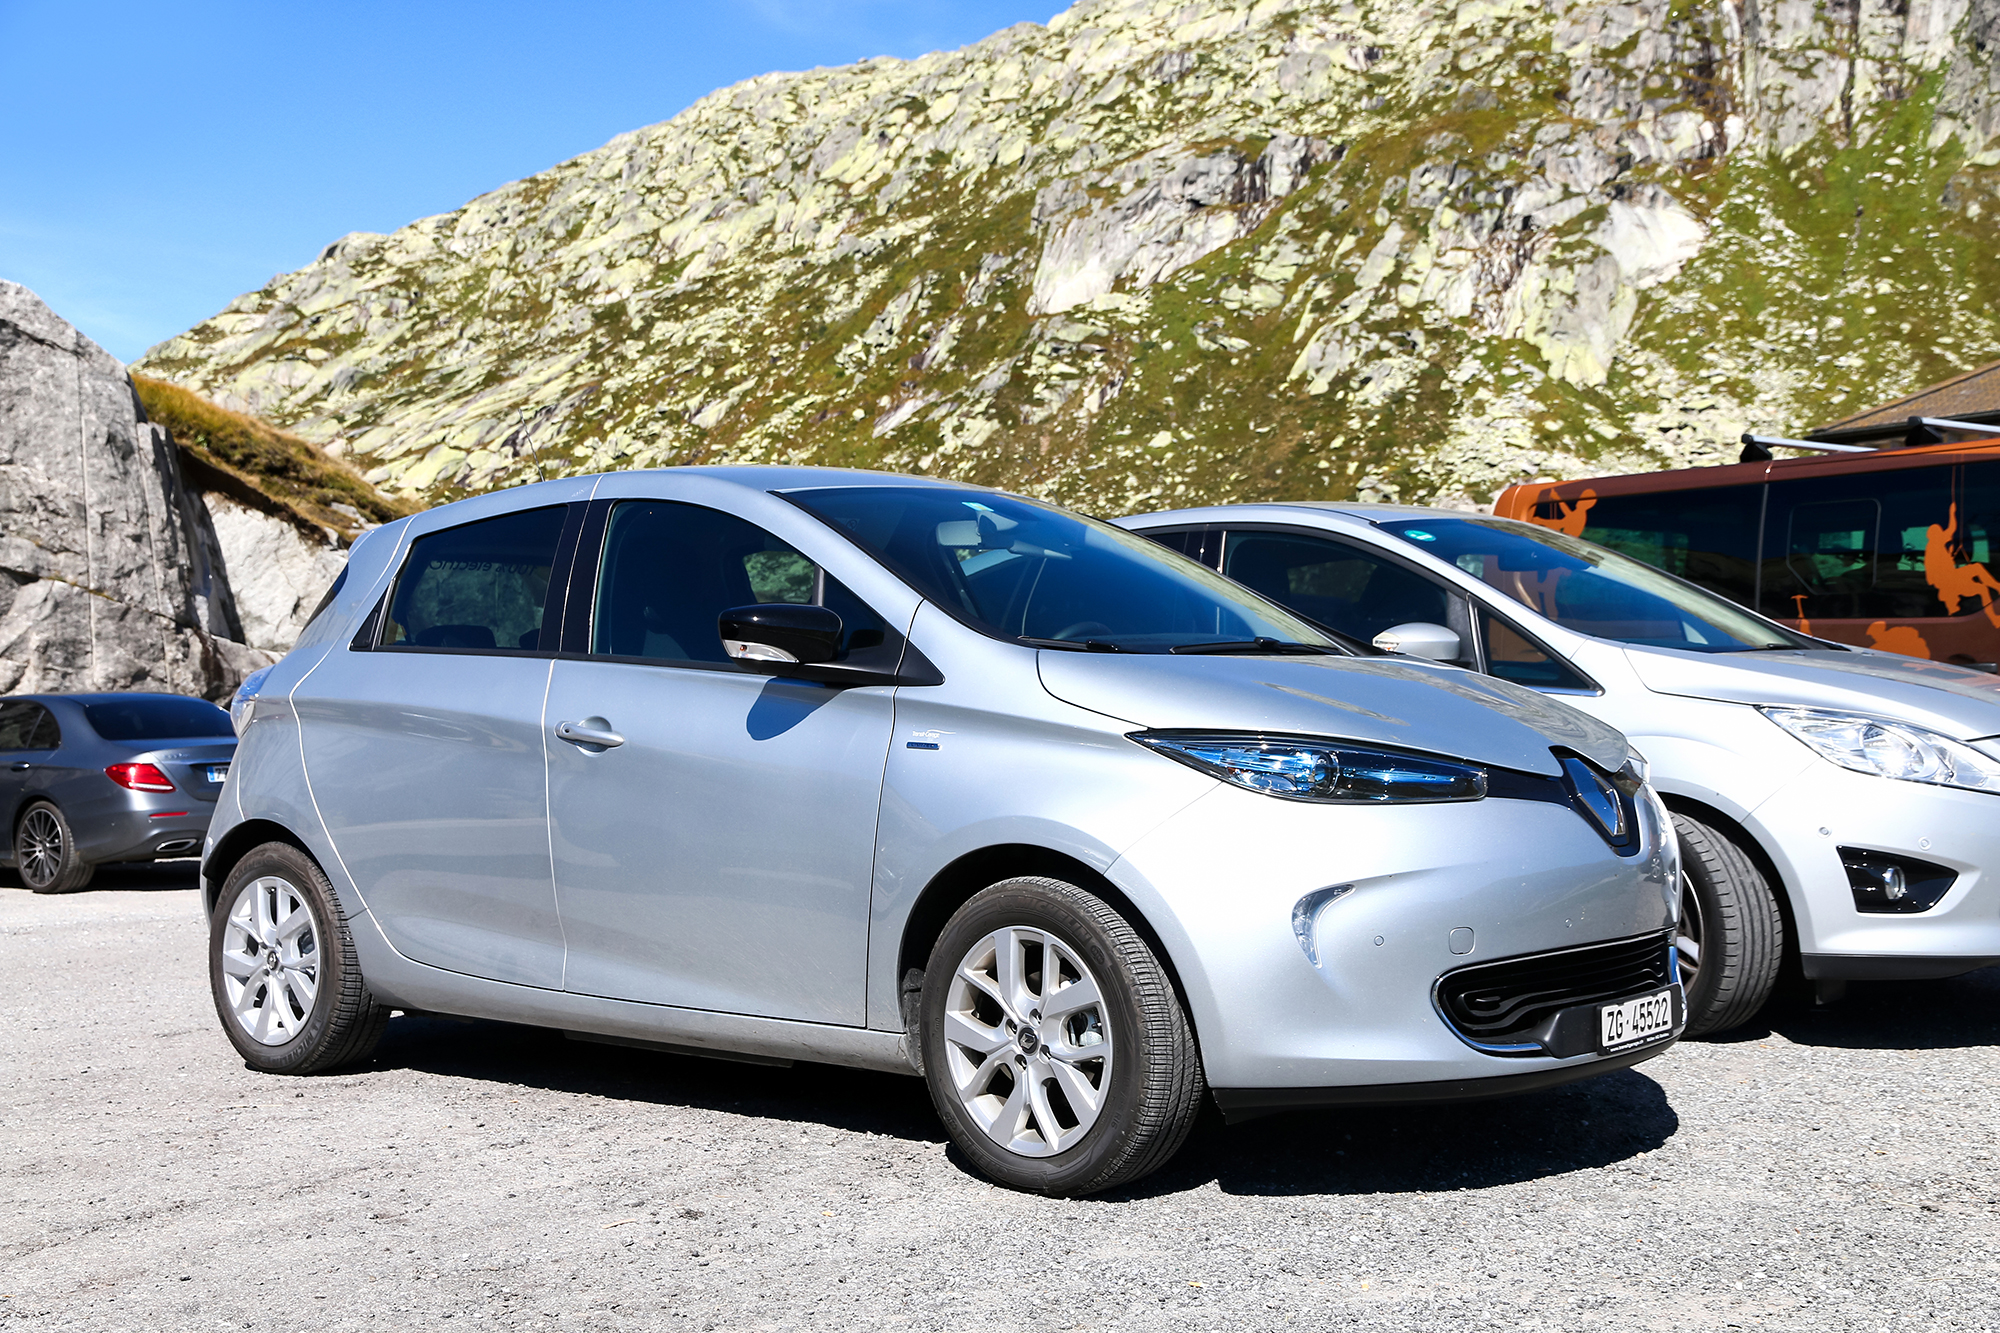 Renault Zoe. (Image: Shutterstock/Art Konovalov)